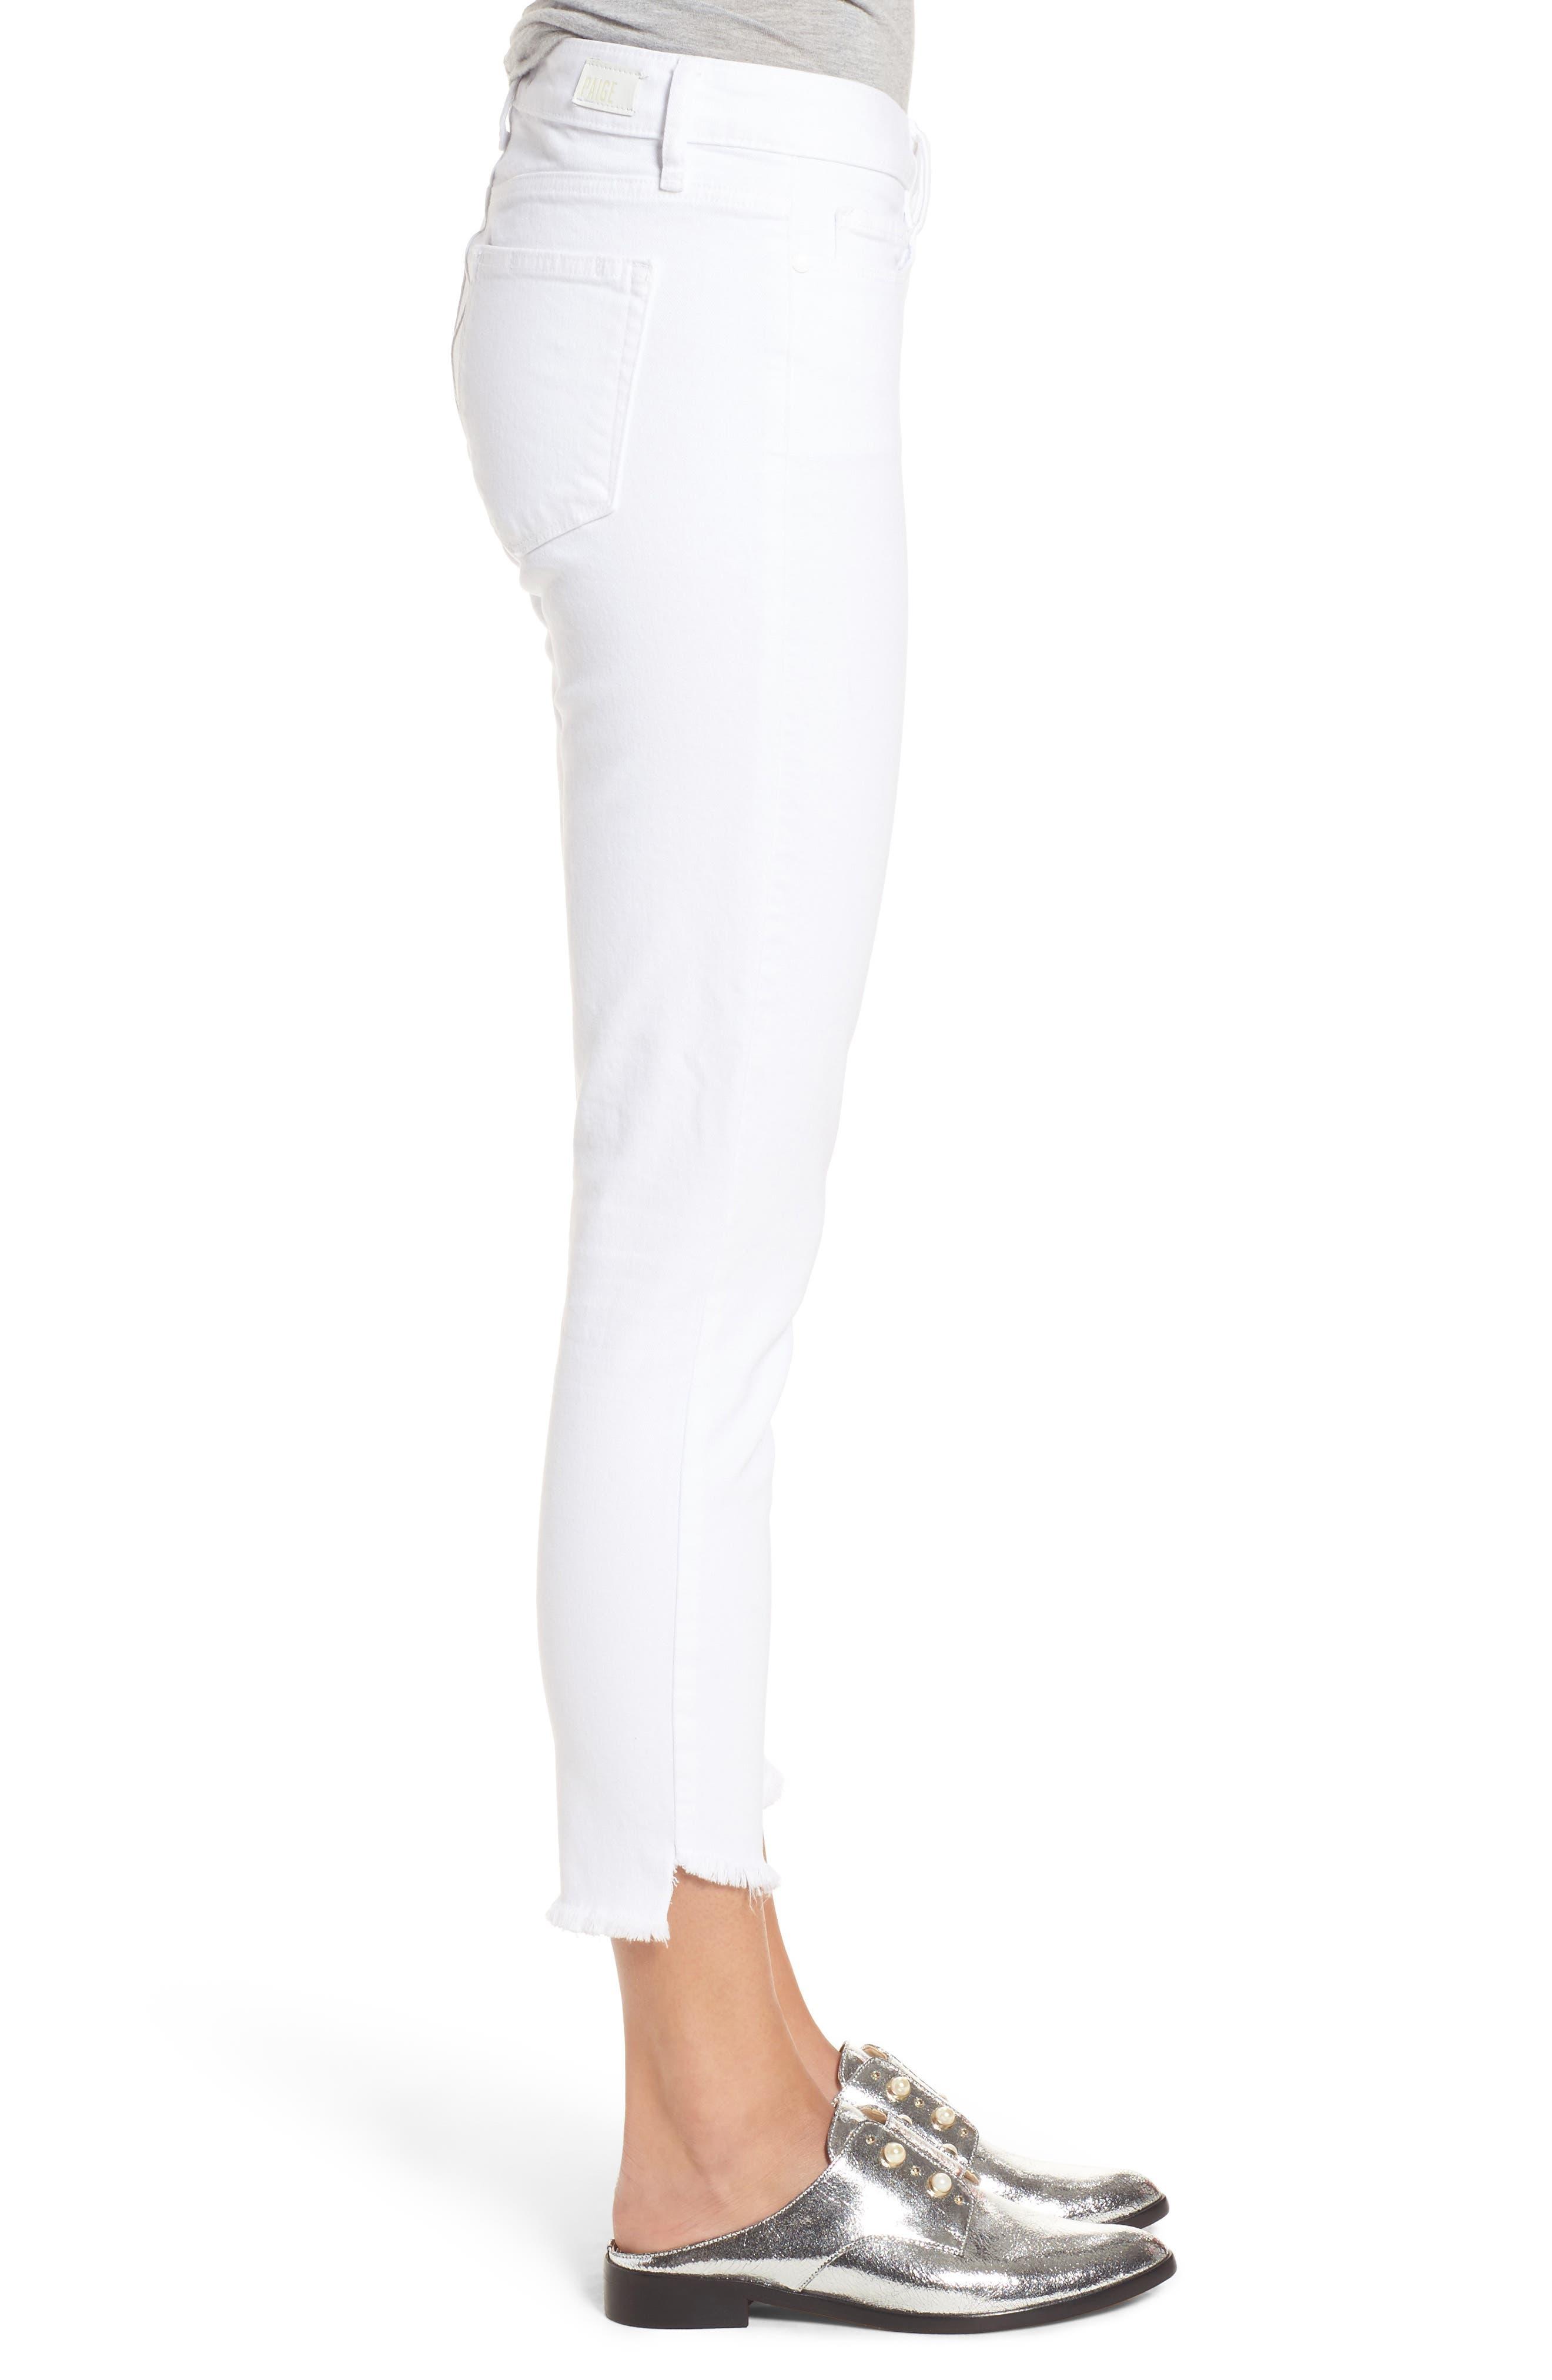 Verdugo Slanted Crop Skinny Jeans,                             Alternate thumbnail 3, color,                             CRISP WHITE